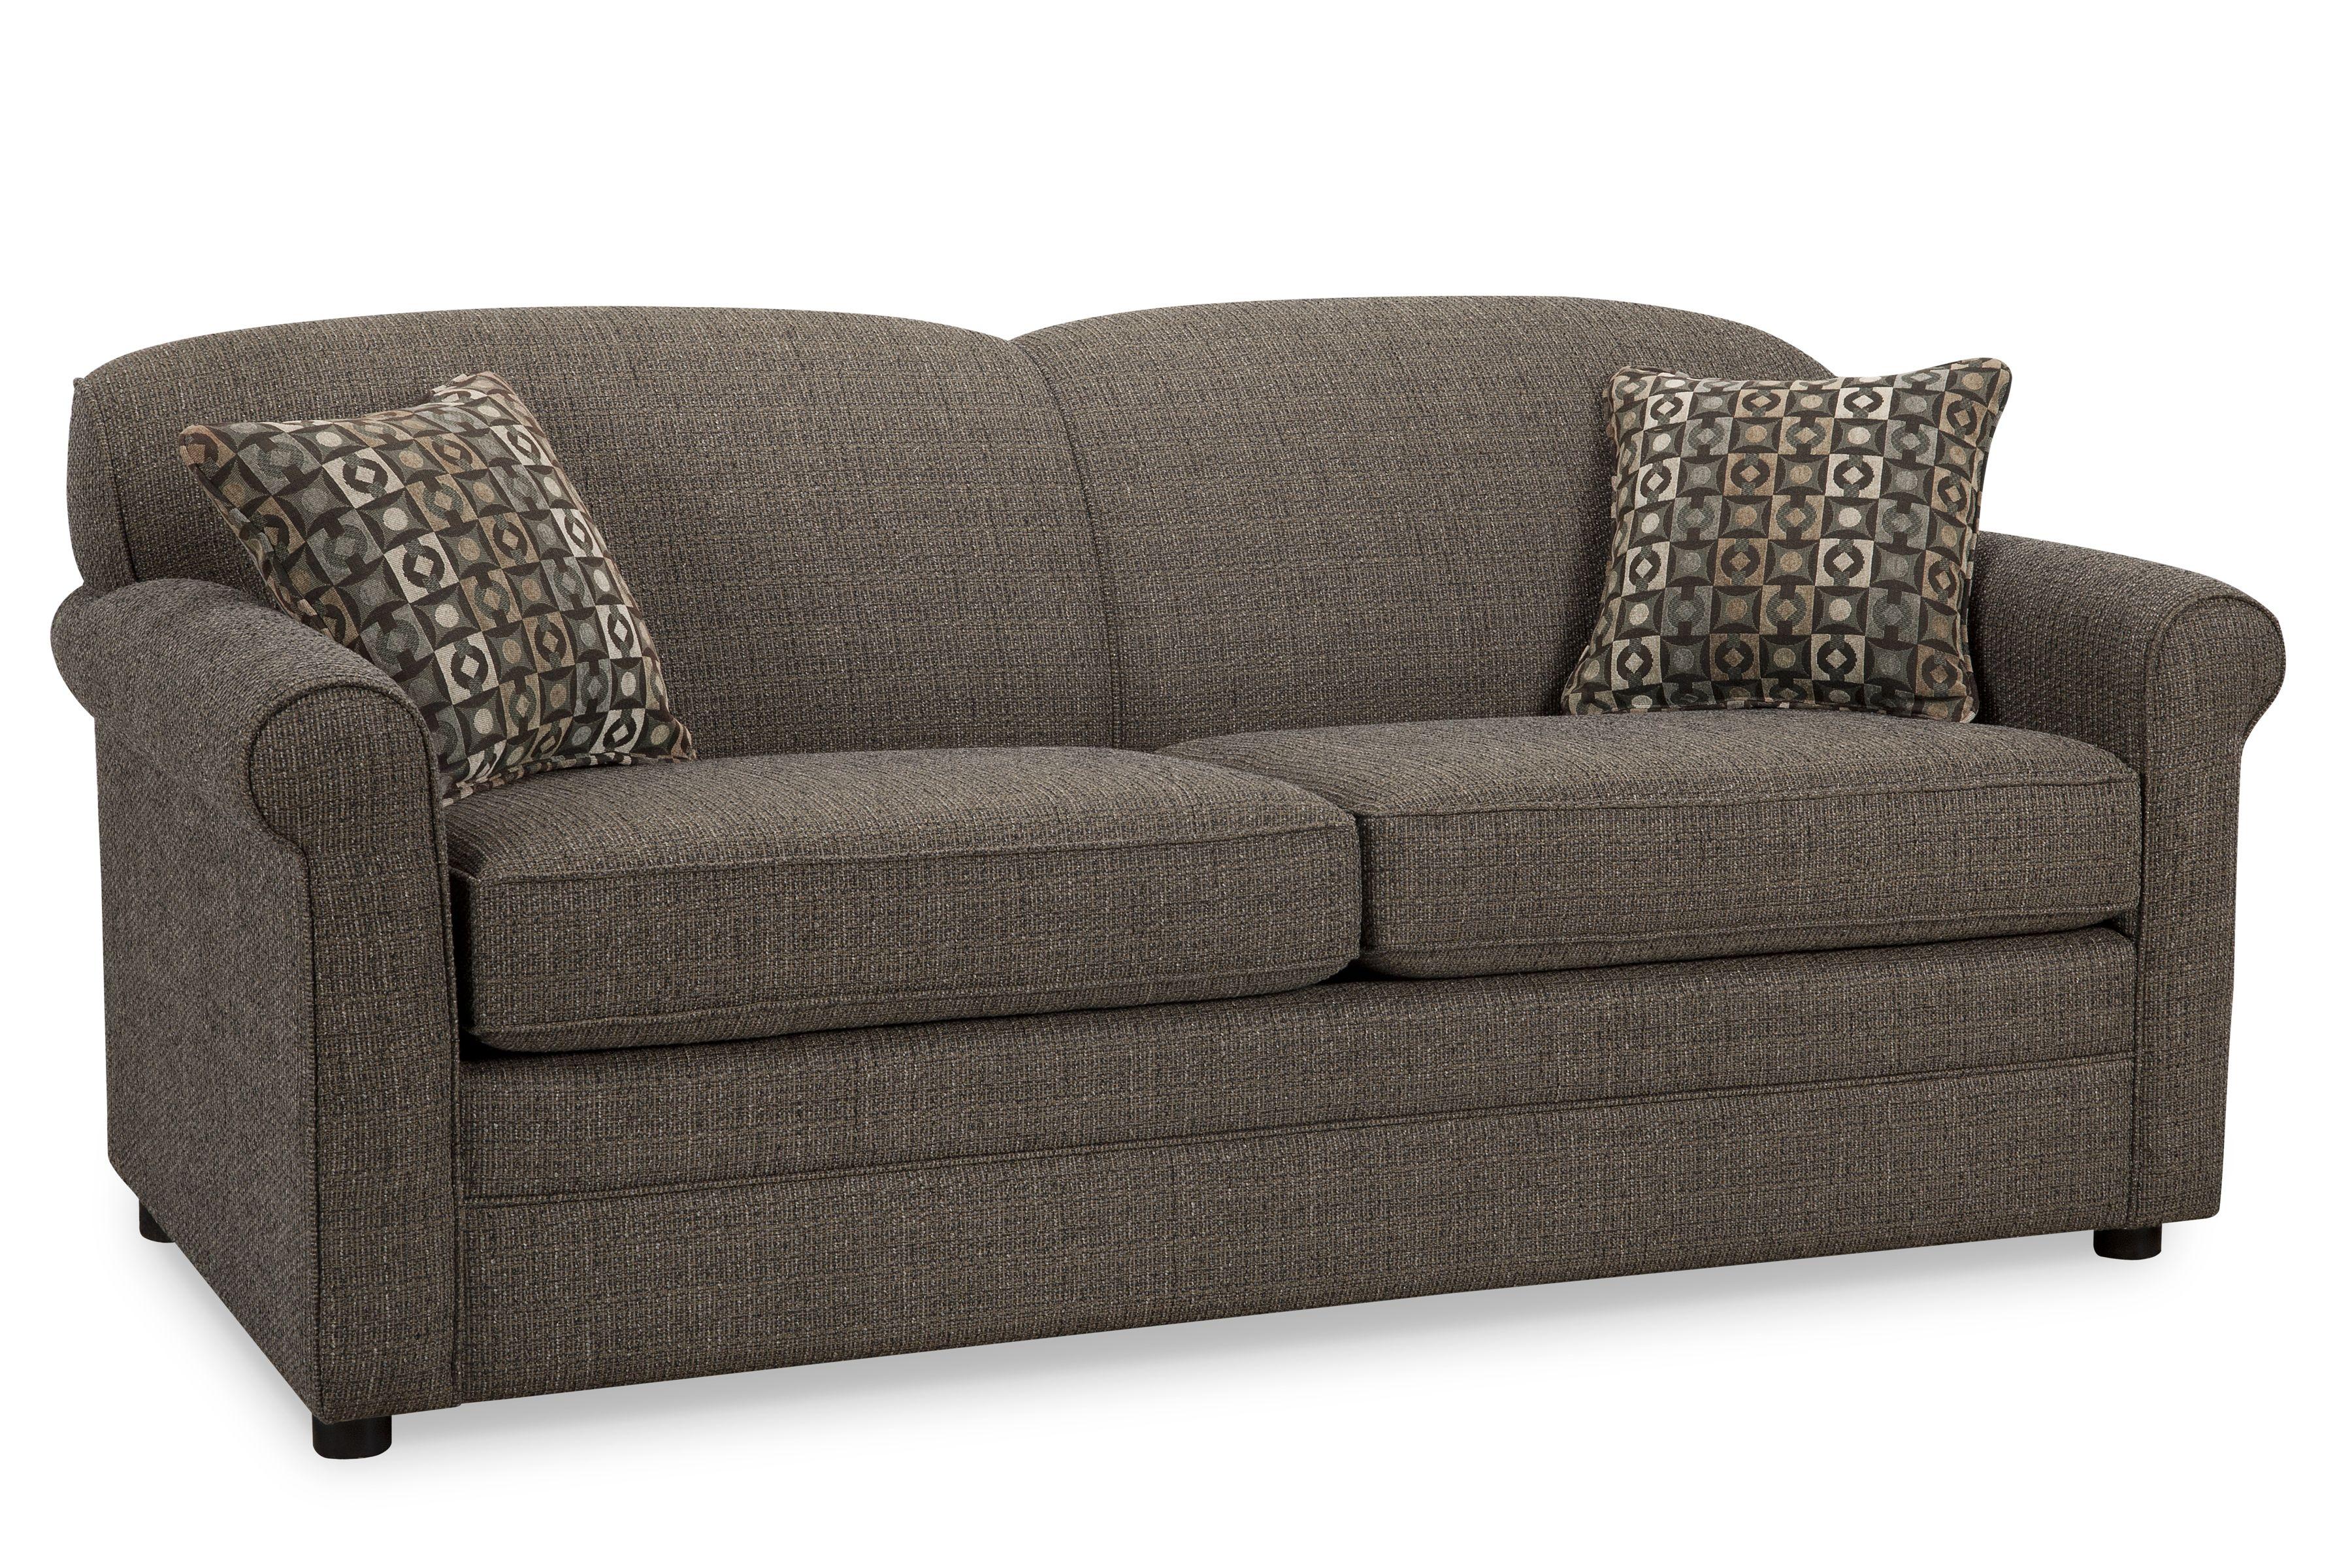 Living Rooms Mattress furniture, Sofa, Double sofa bed